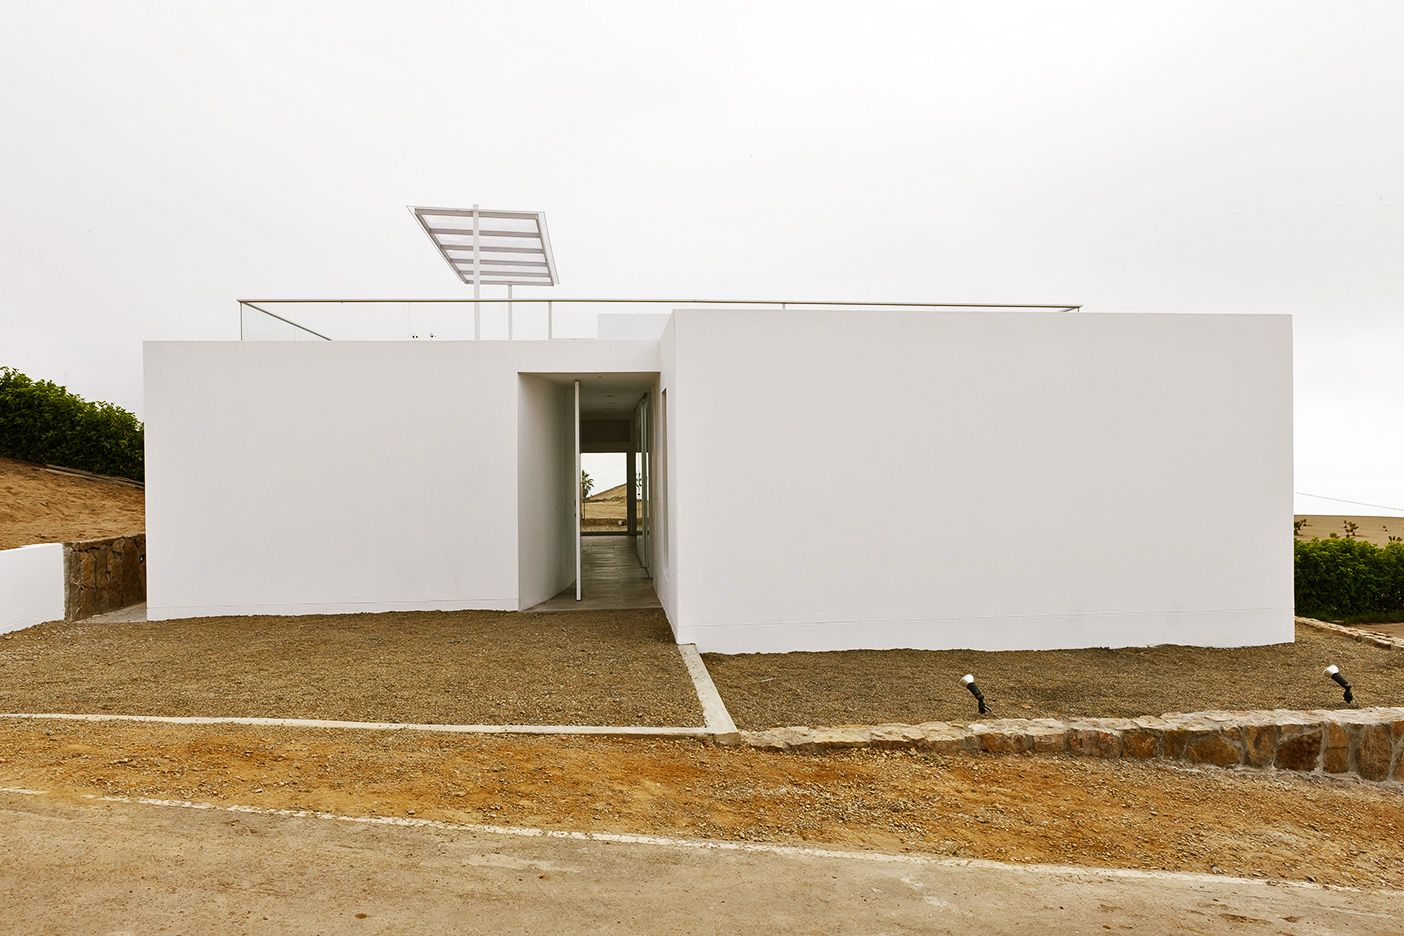 llatas #architecture #architects #design #white #Peru #Andenes ...